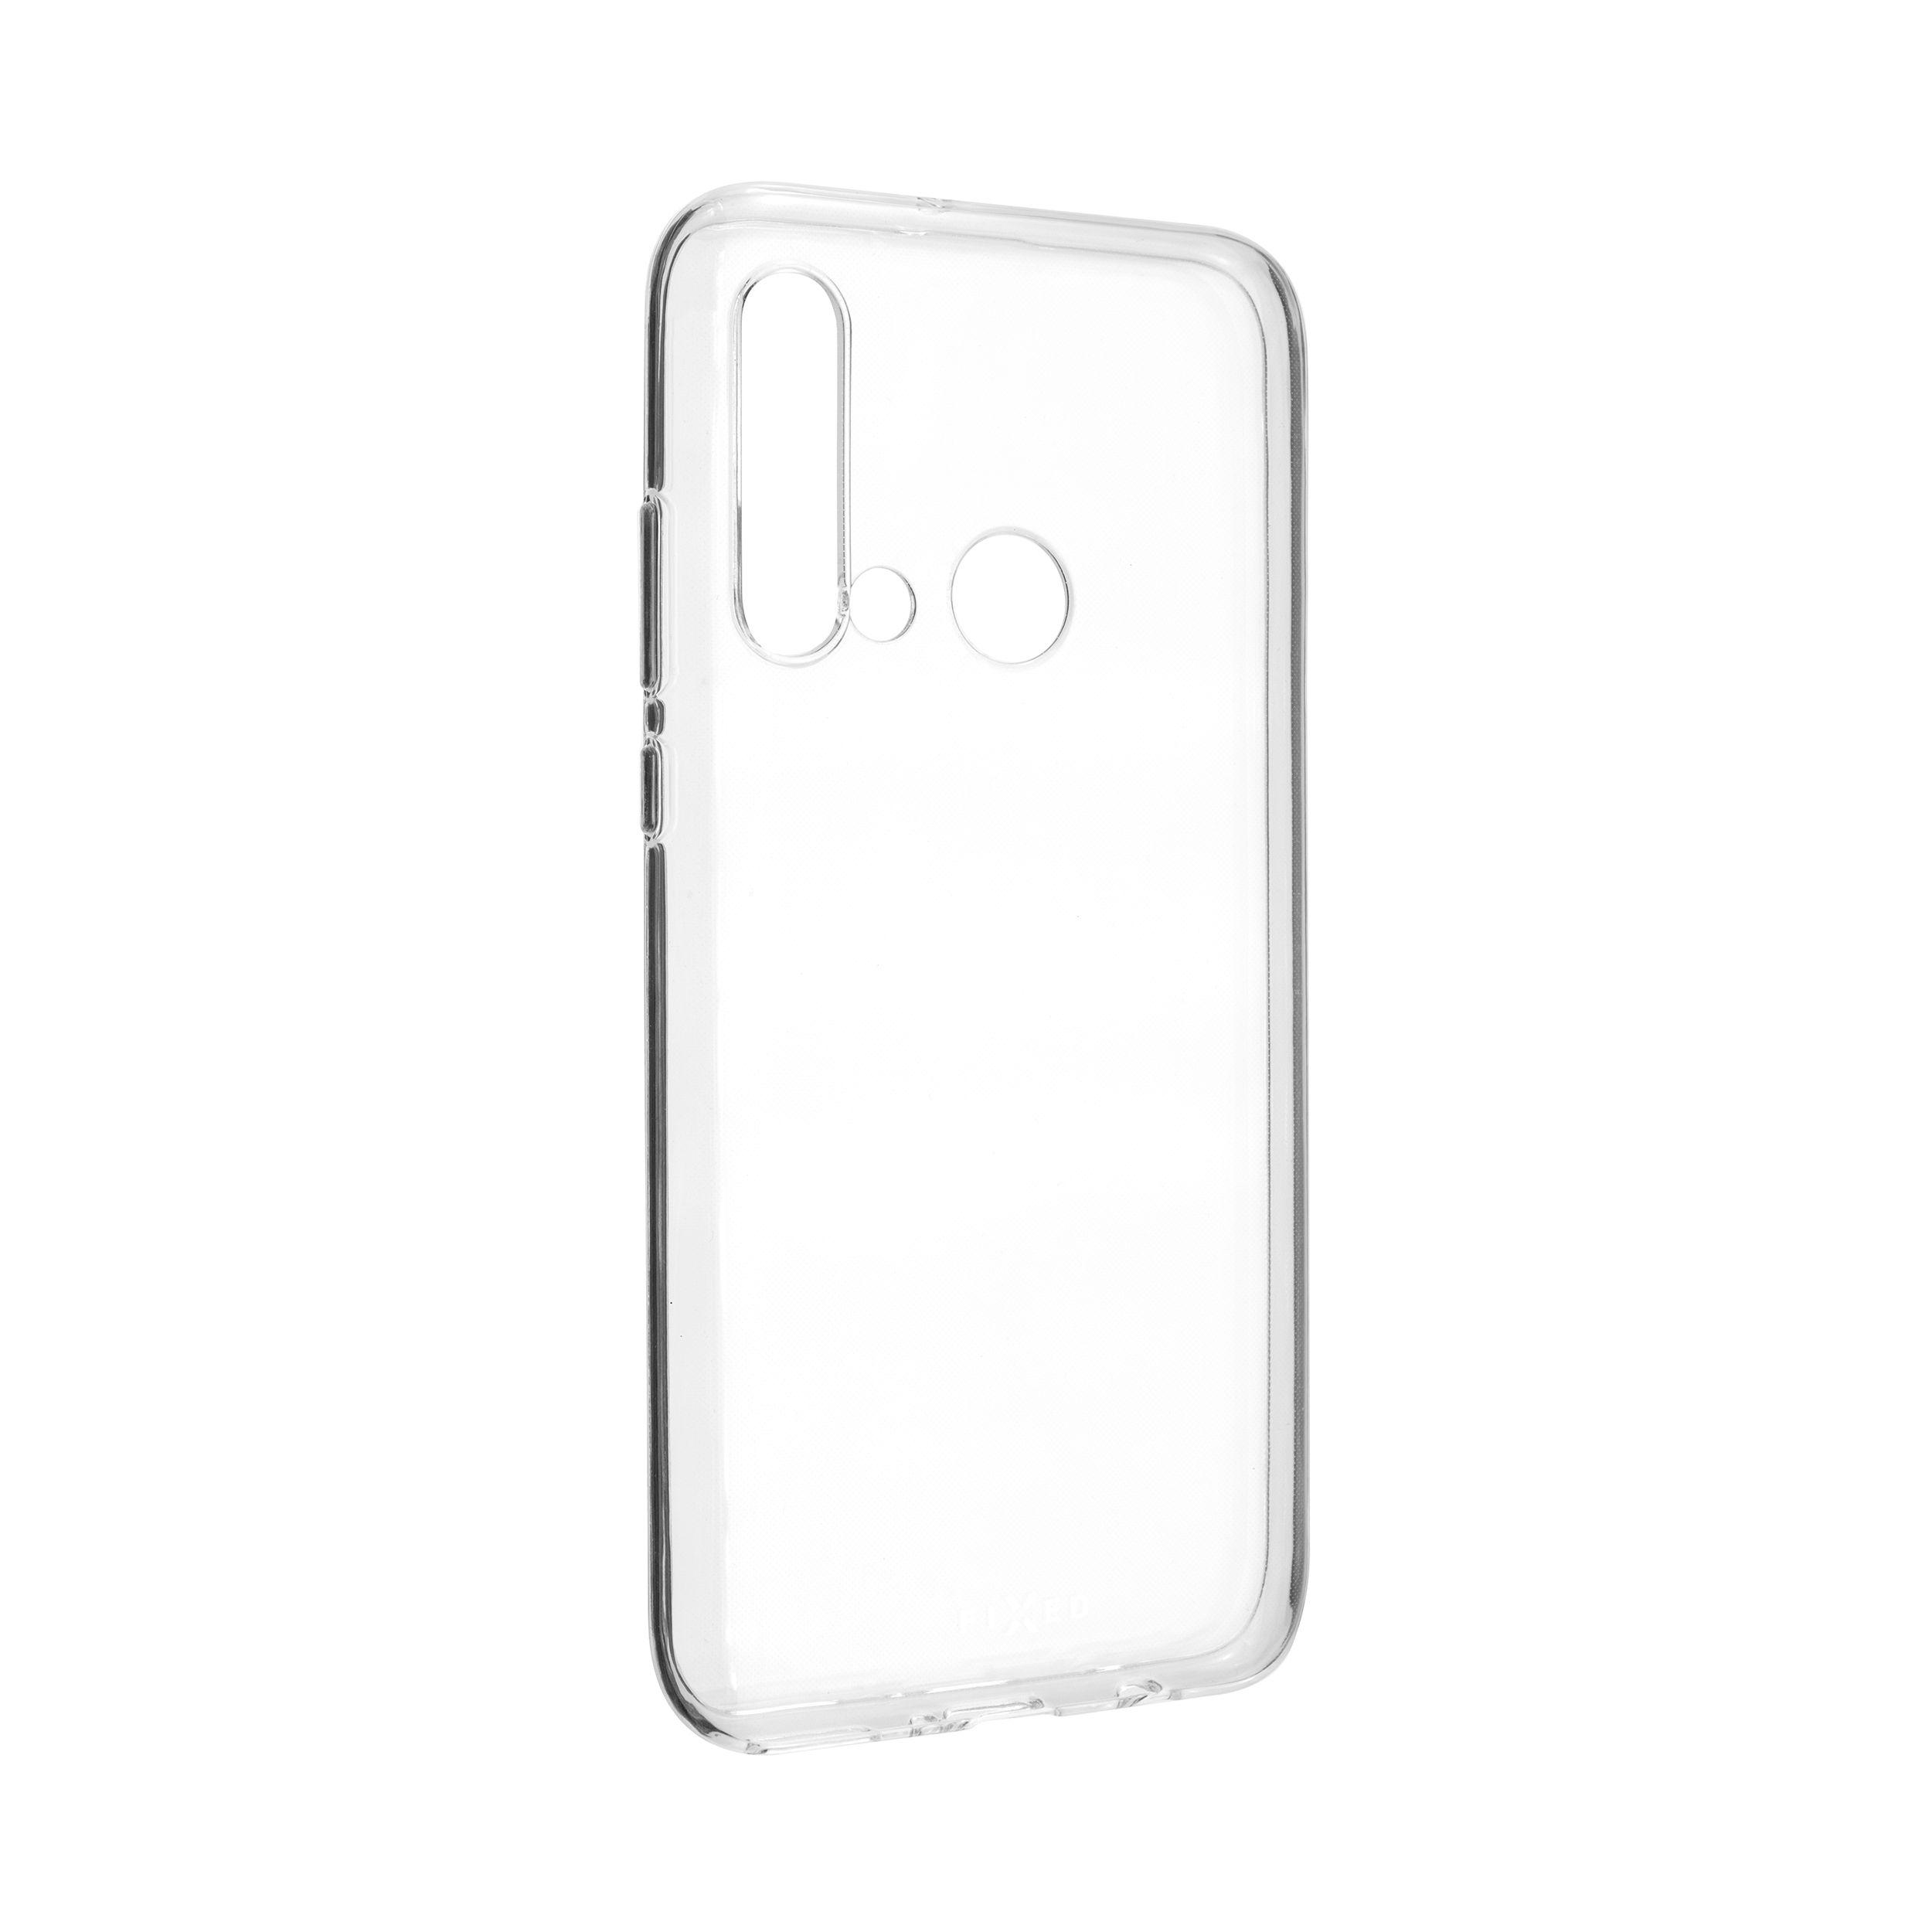 Ultratenké TPU gelové pouzdro FIXED Skin pro Huawei P20 Lite (2019), 0,6 mm, čiré